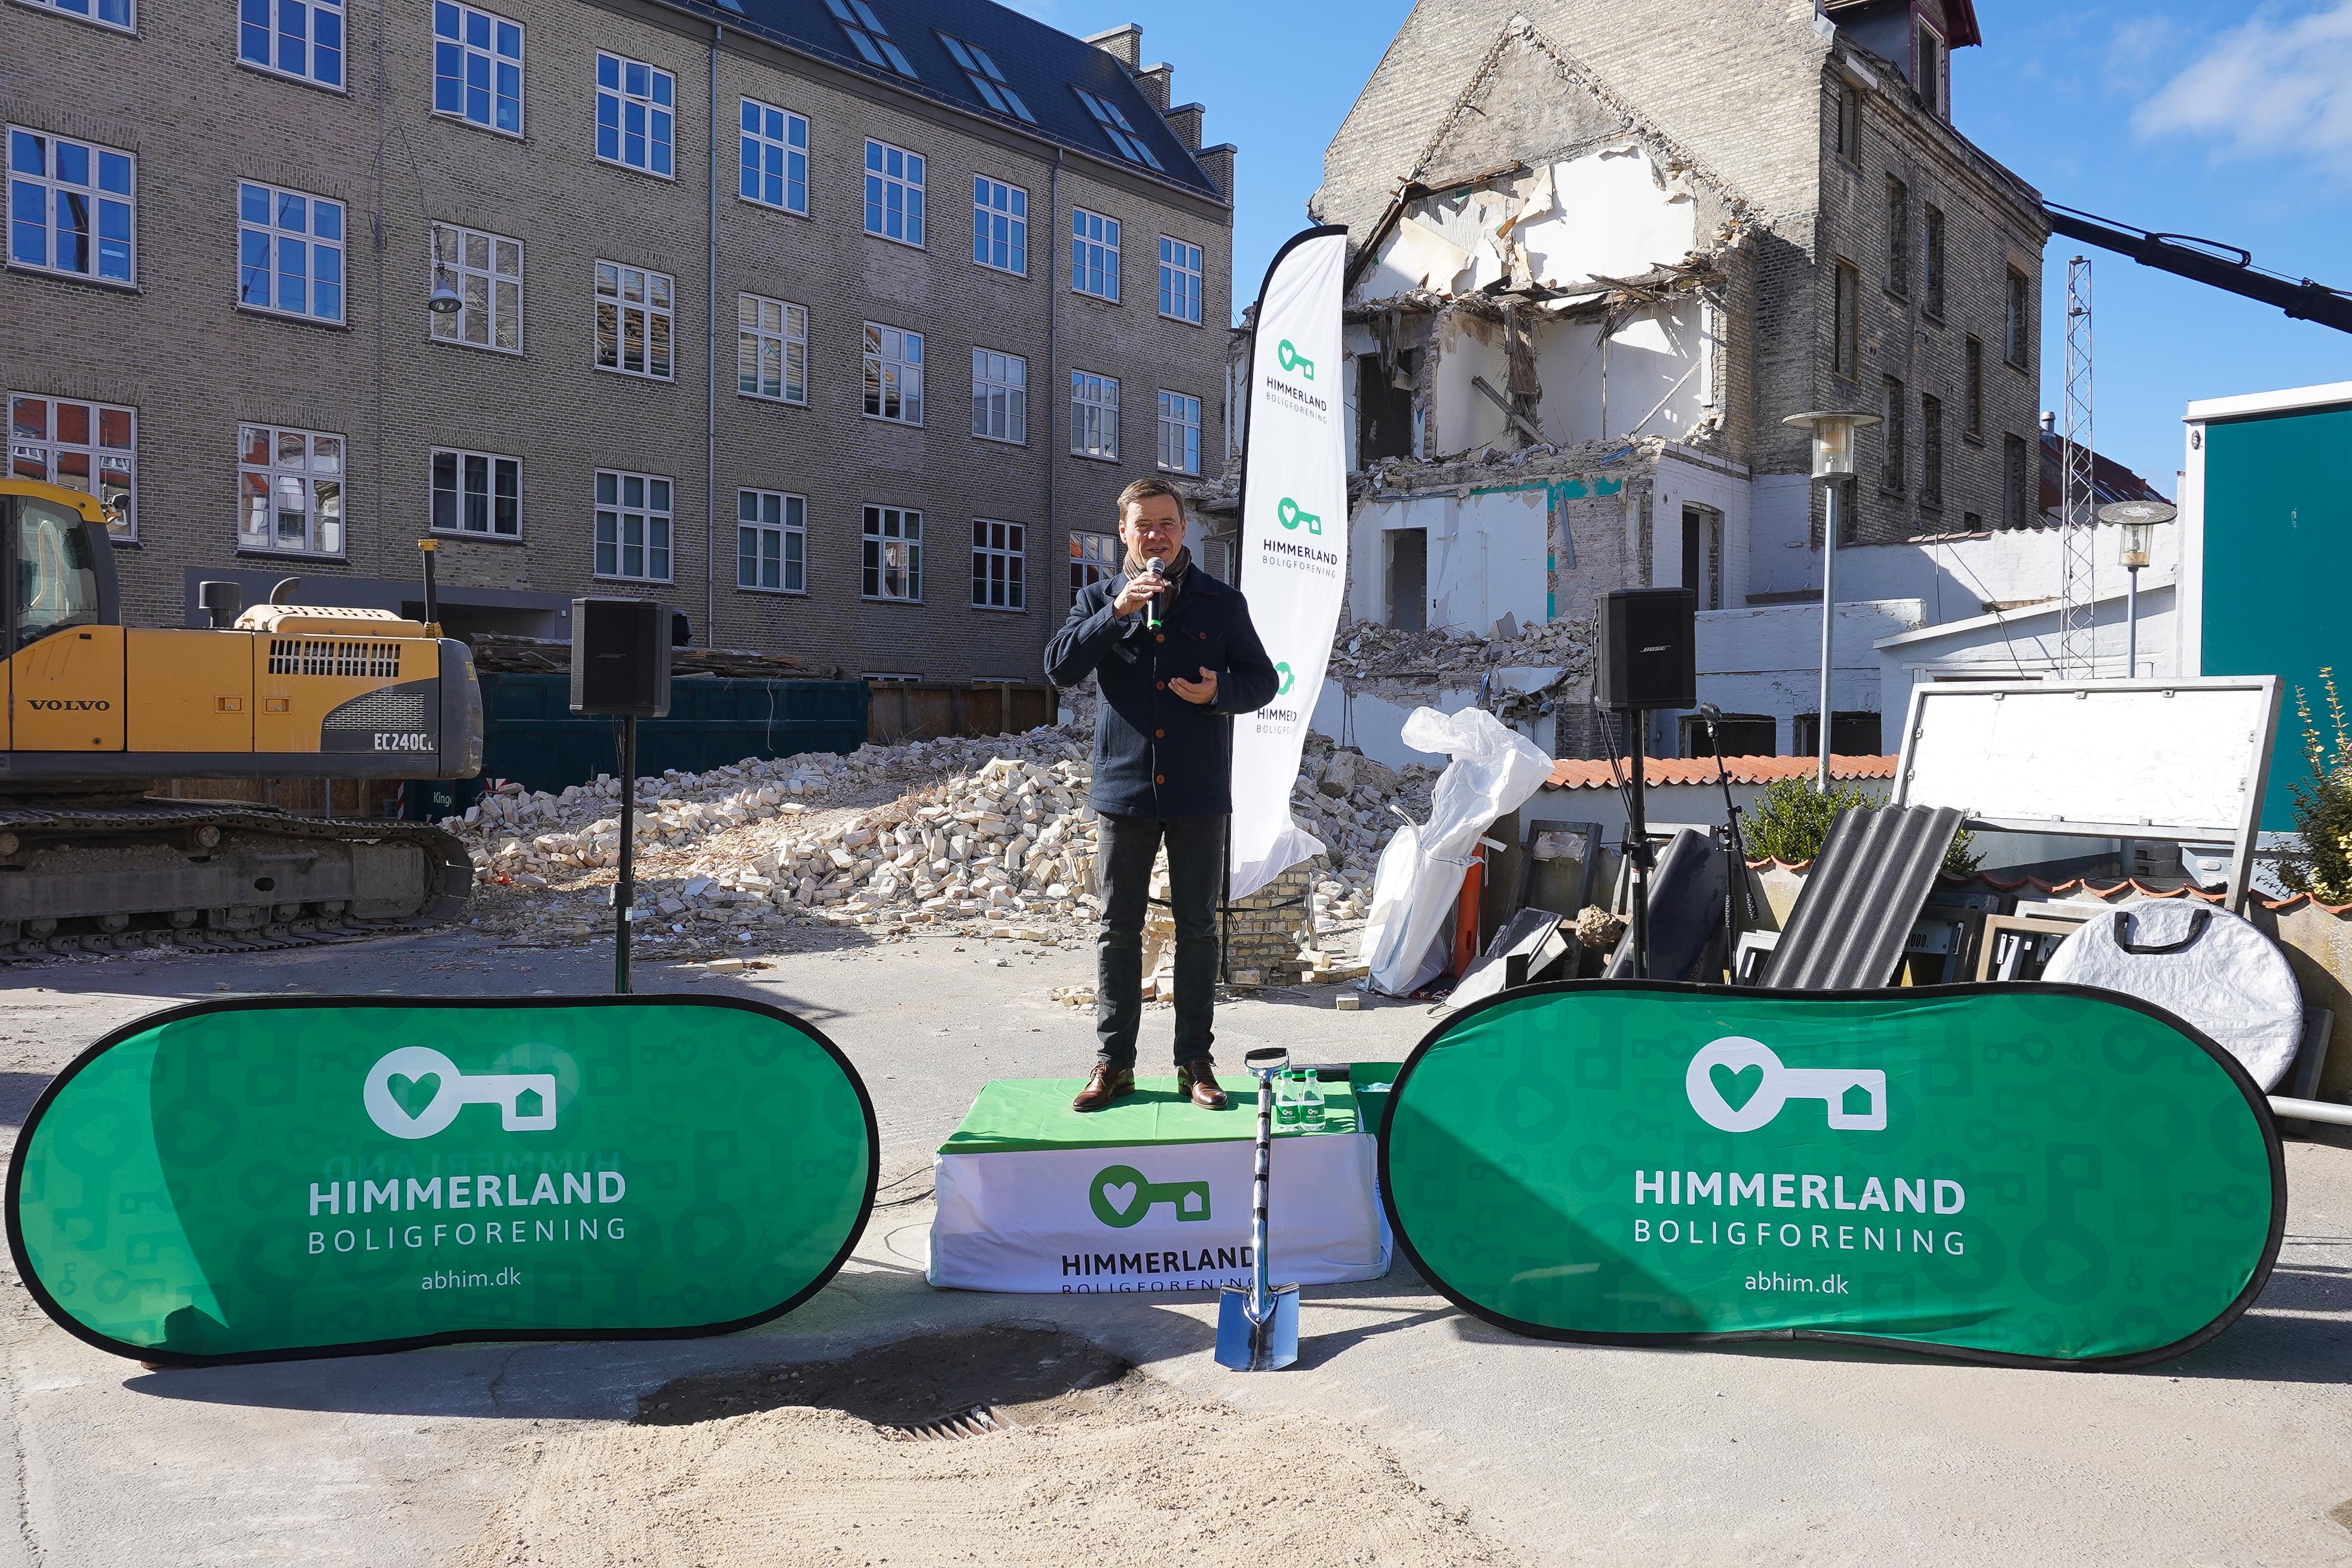 Første spadestik i Aalborgs vugge: Penthouse- og almene boliger blandes